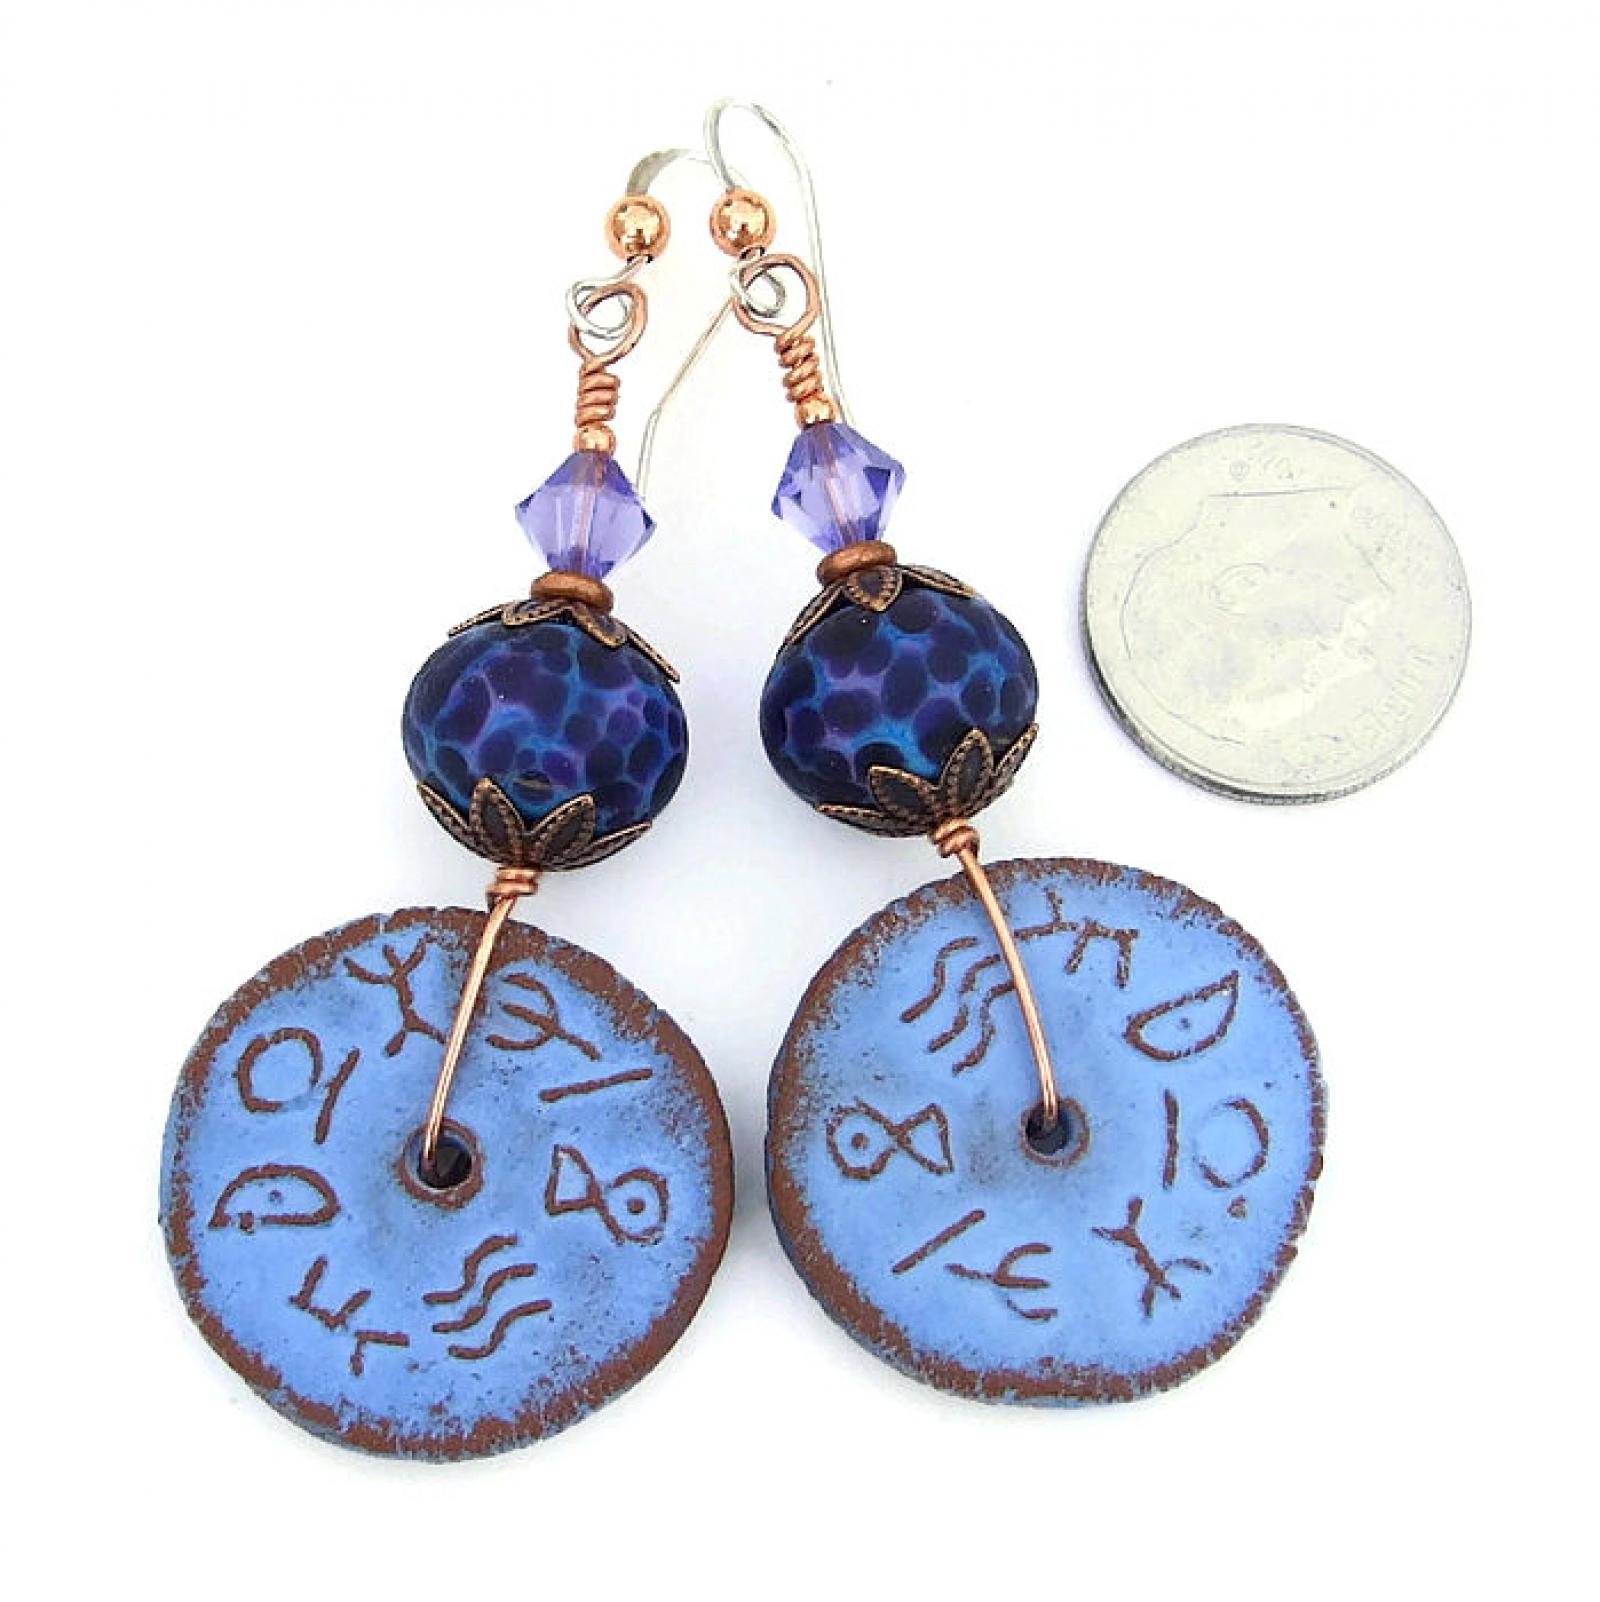 Free Shipping Sites >> Rustic Runes Handmade Earrings, Ceramic Purple Lampwork ...